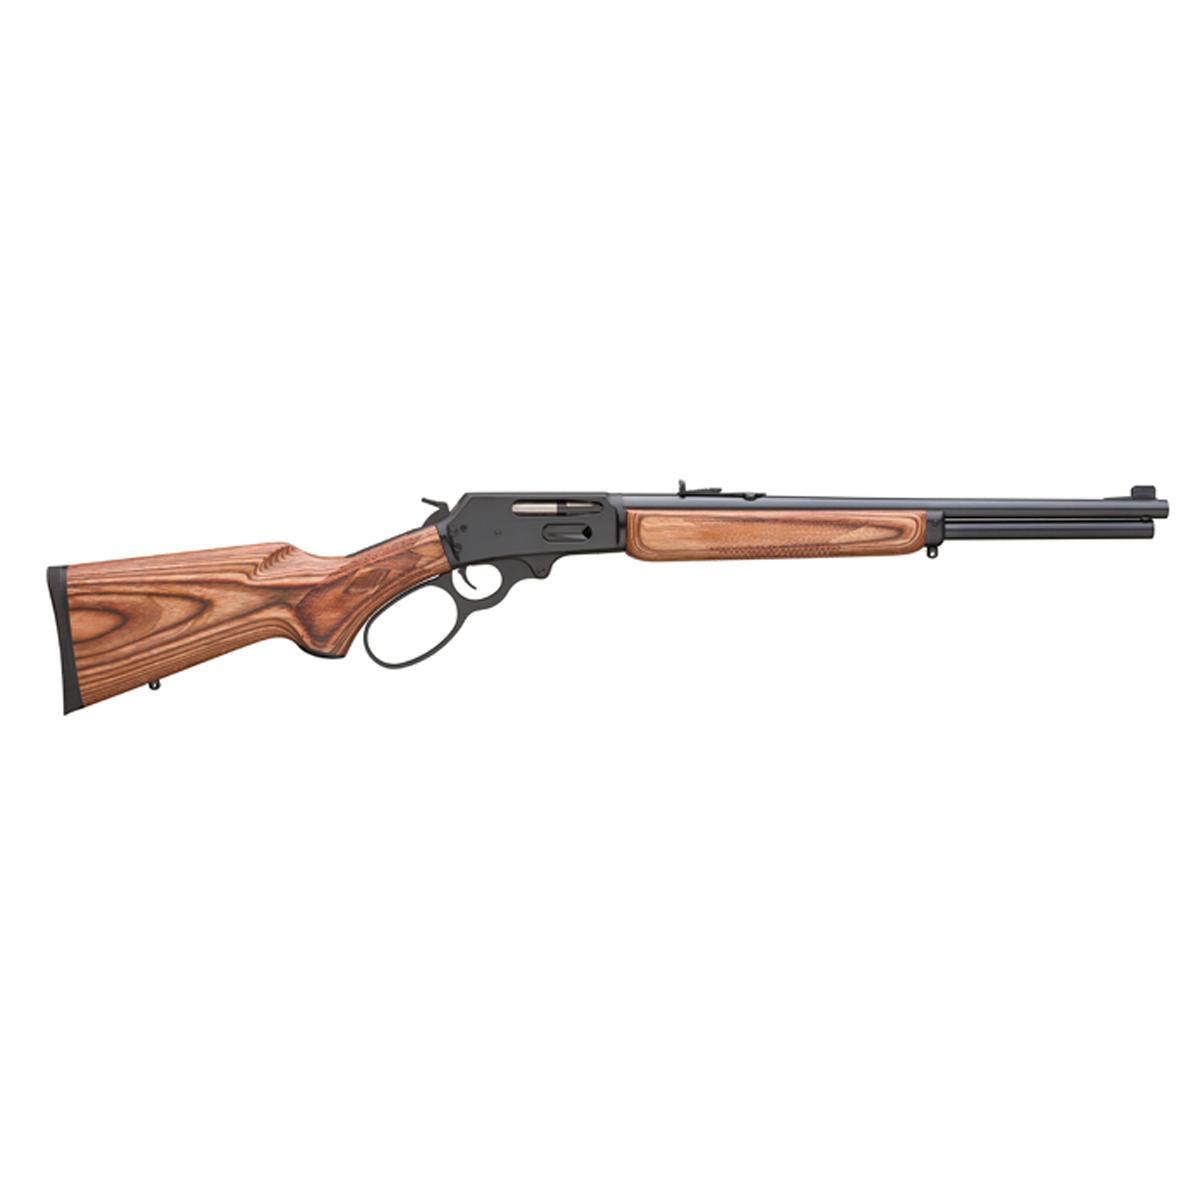 Marlin 336BL Big Loop .30-30 - Fisher Firearms